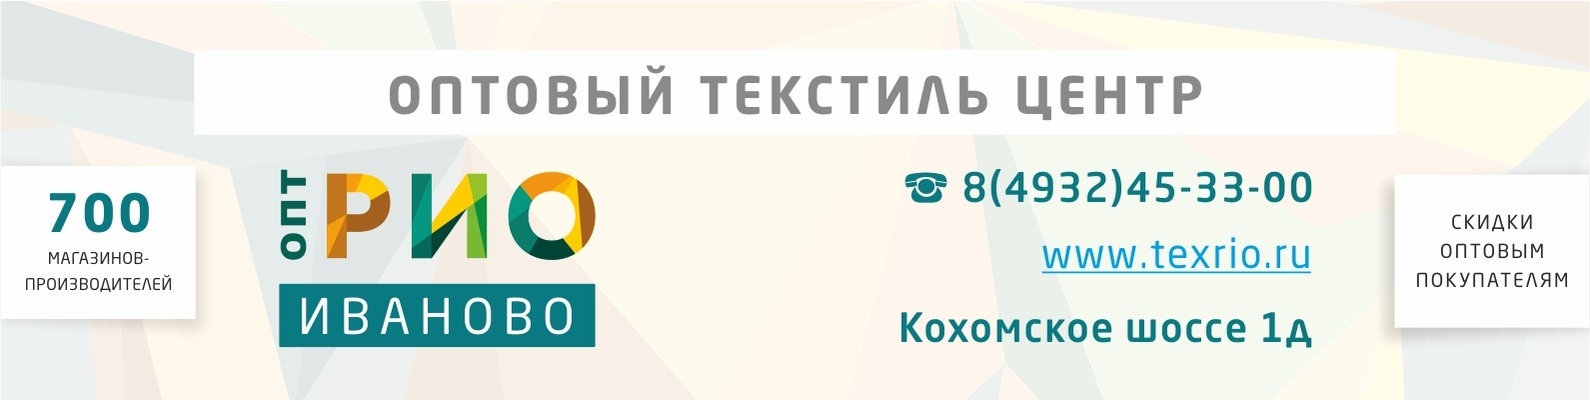 a6a14d56e РИО-Иваново оптовый текстиль-центр | ВКонтакте